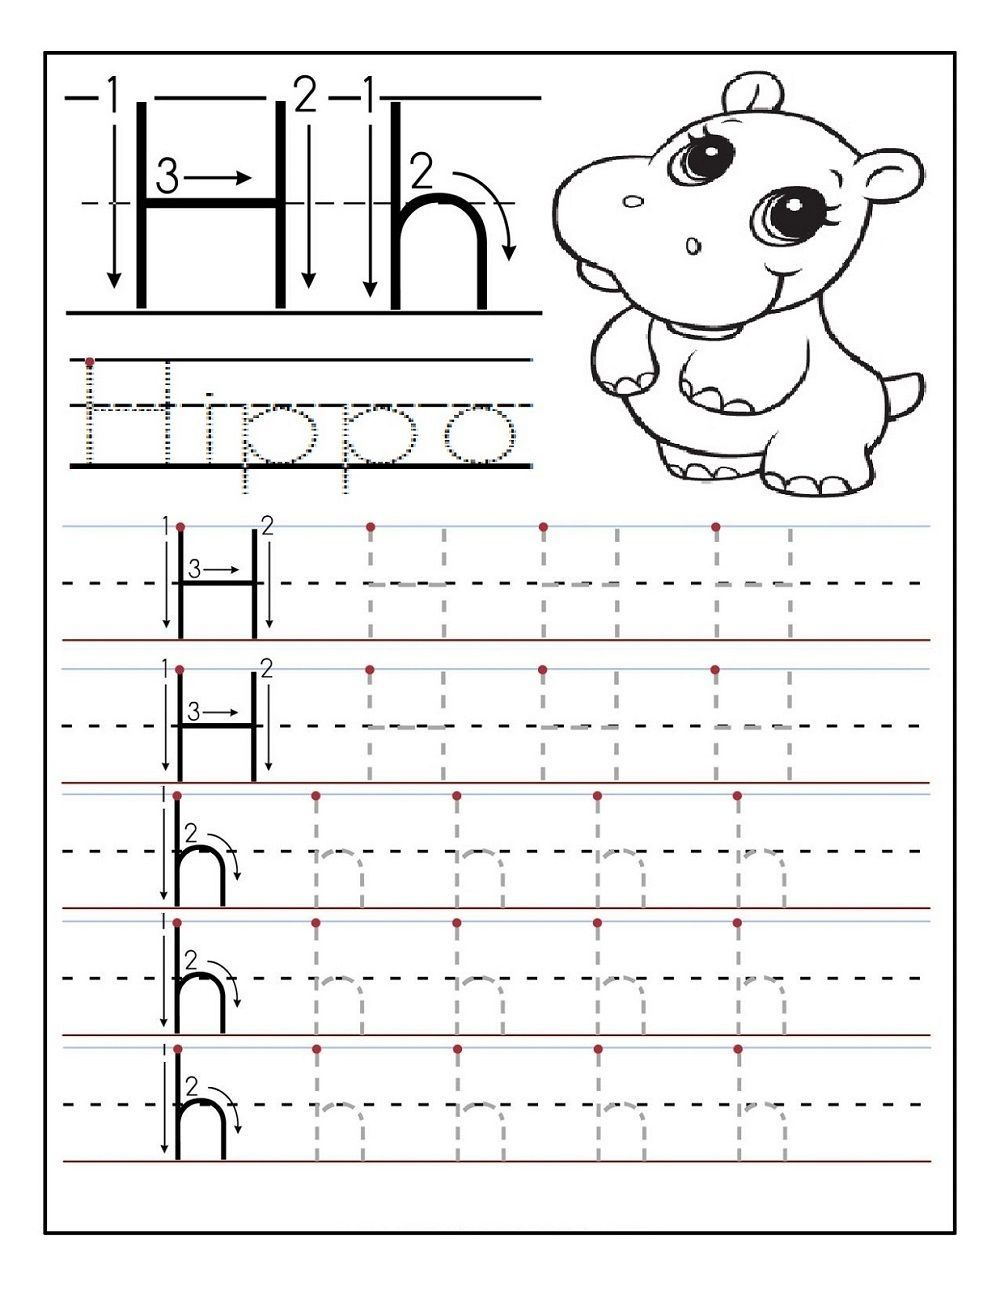 Tracing Worksheets 3 Year Old Fun   Tracing worksheets preschool [ 1294 x 1000 Pixel ]